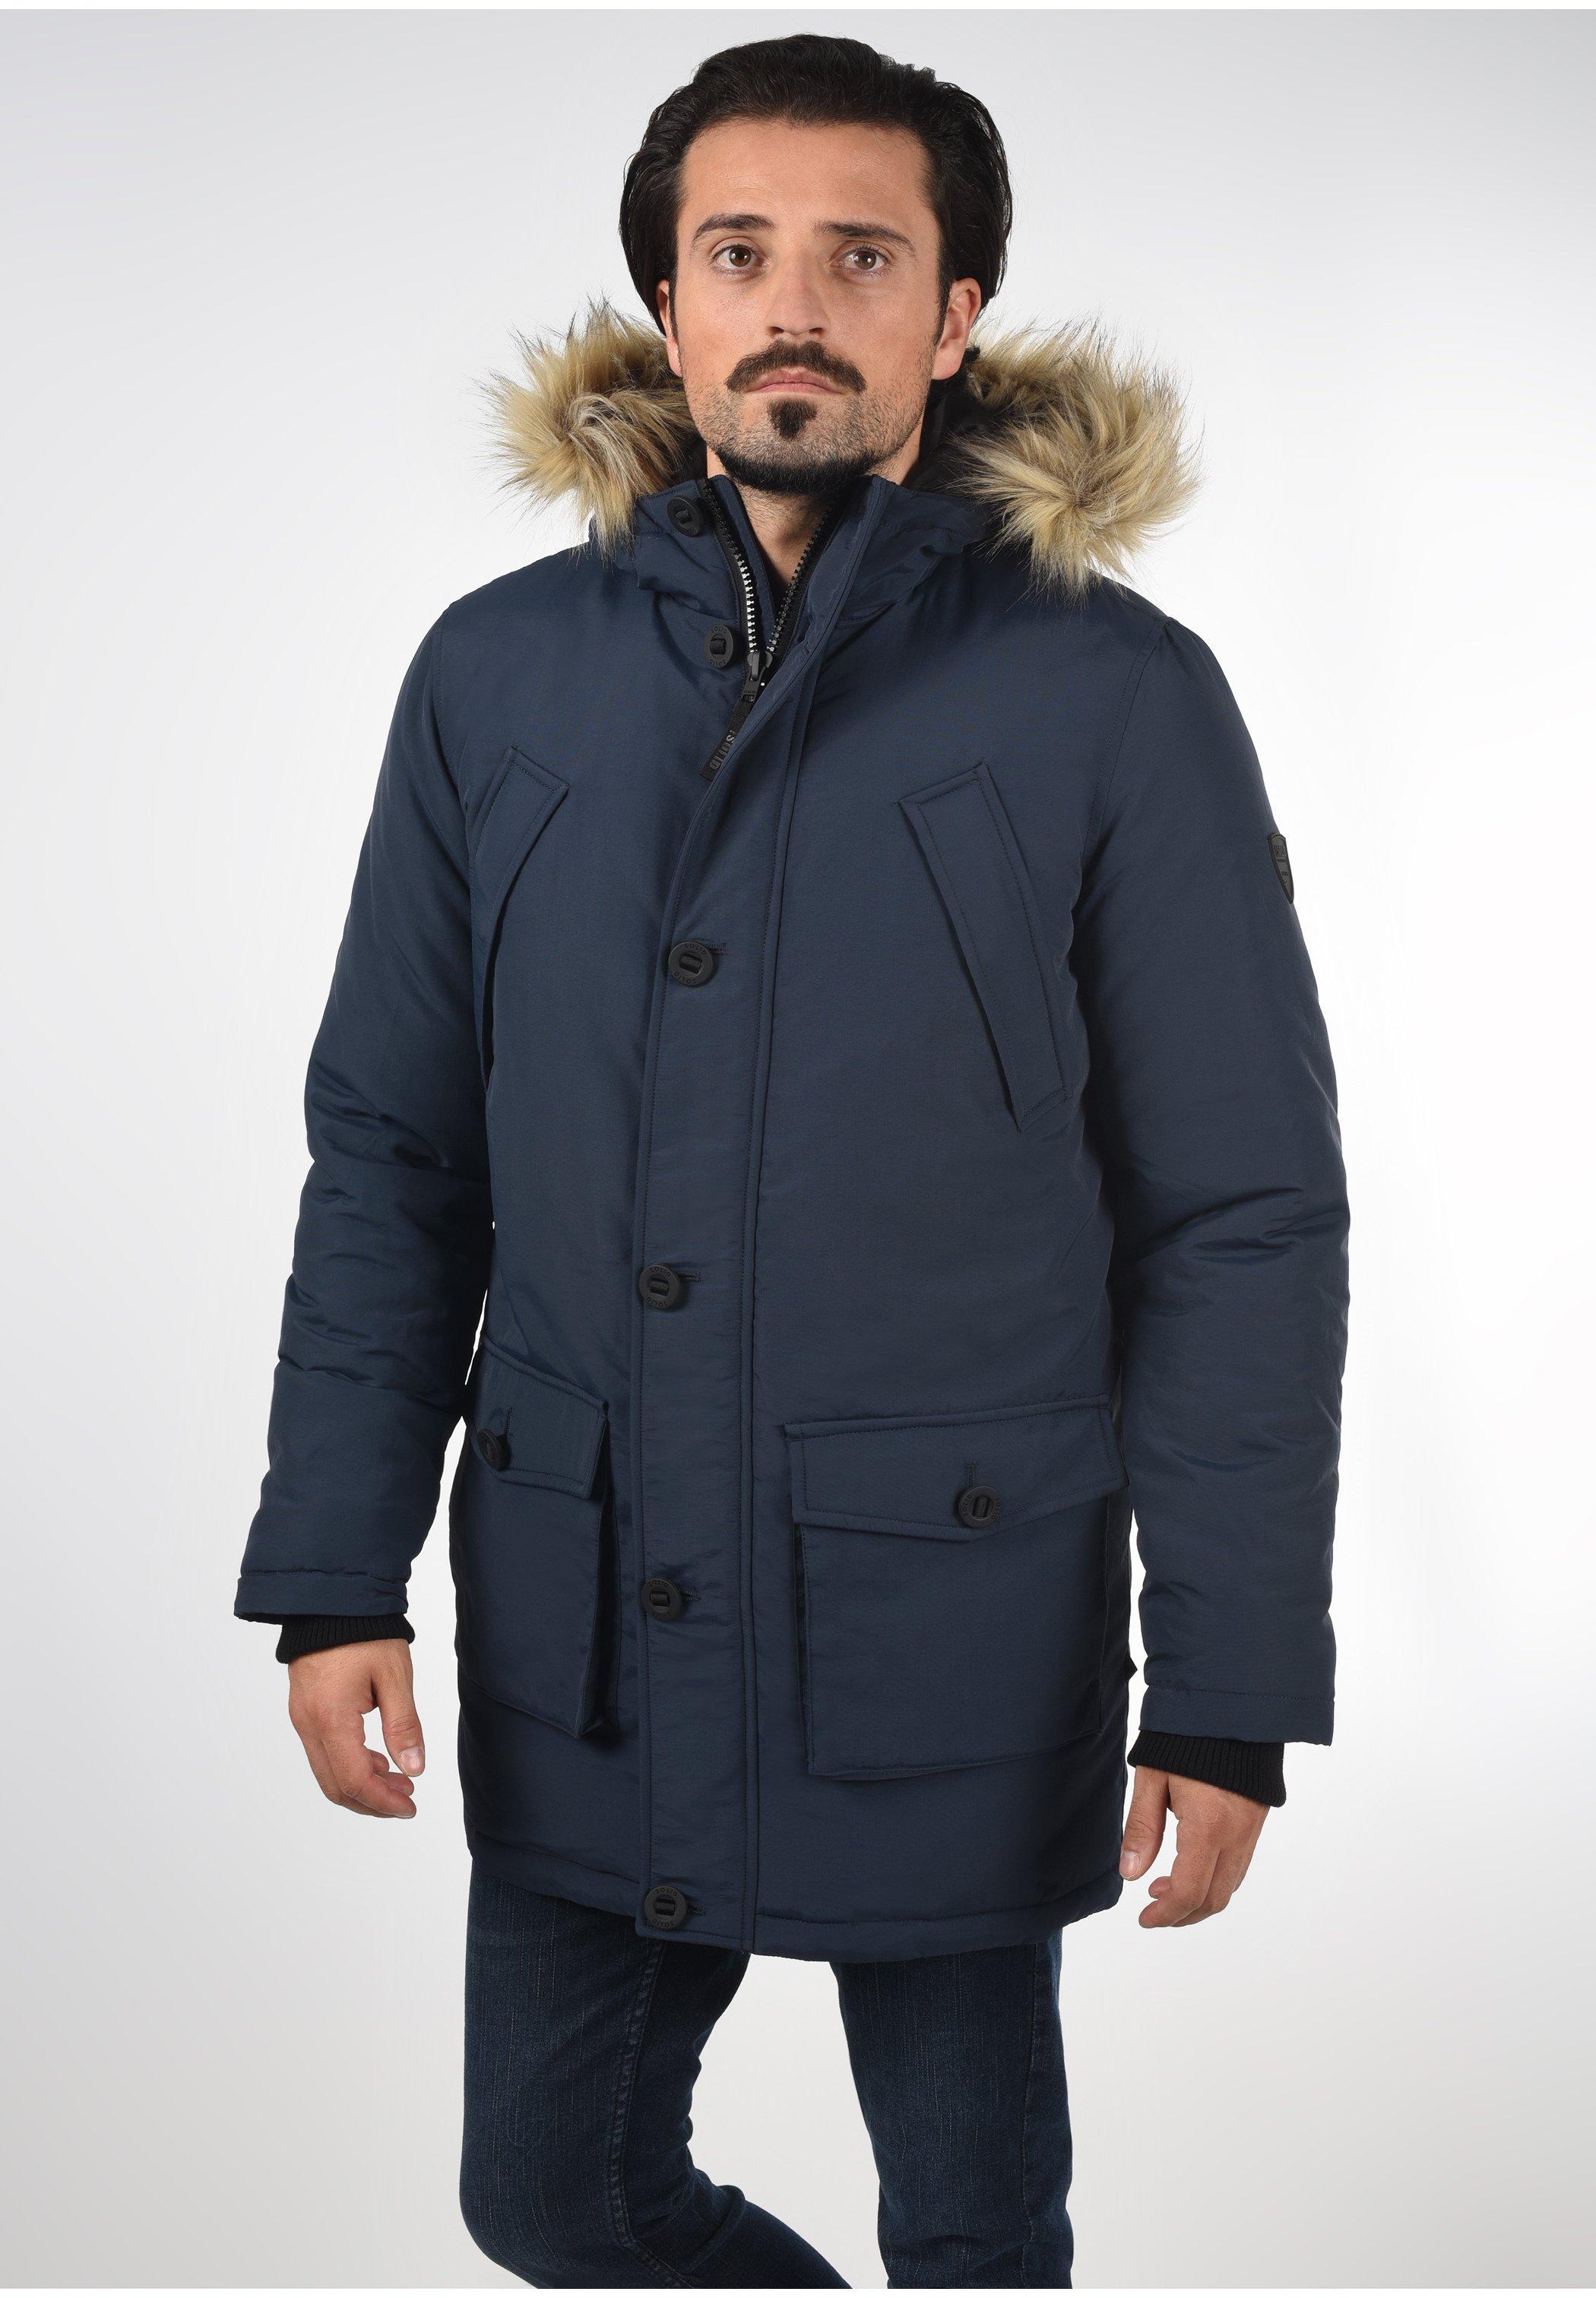 Homme FRIGO - Veste d'hiver